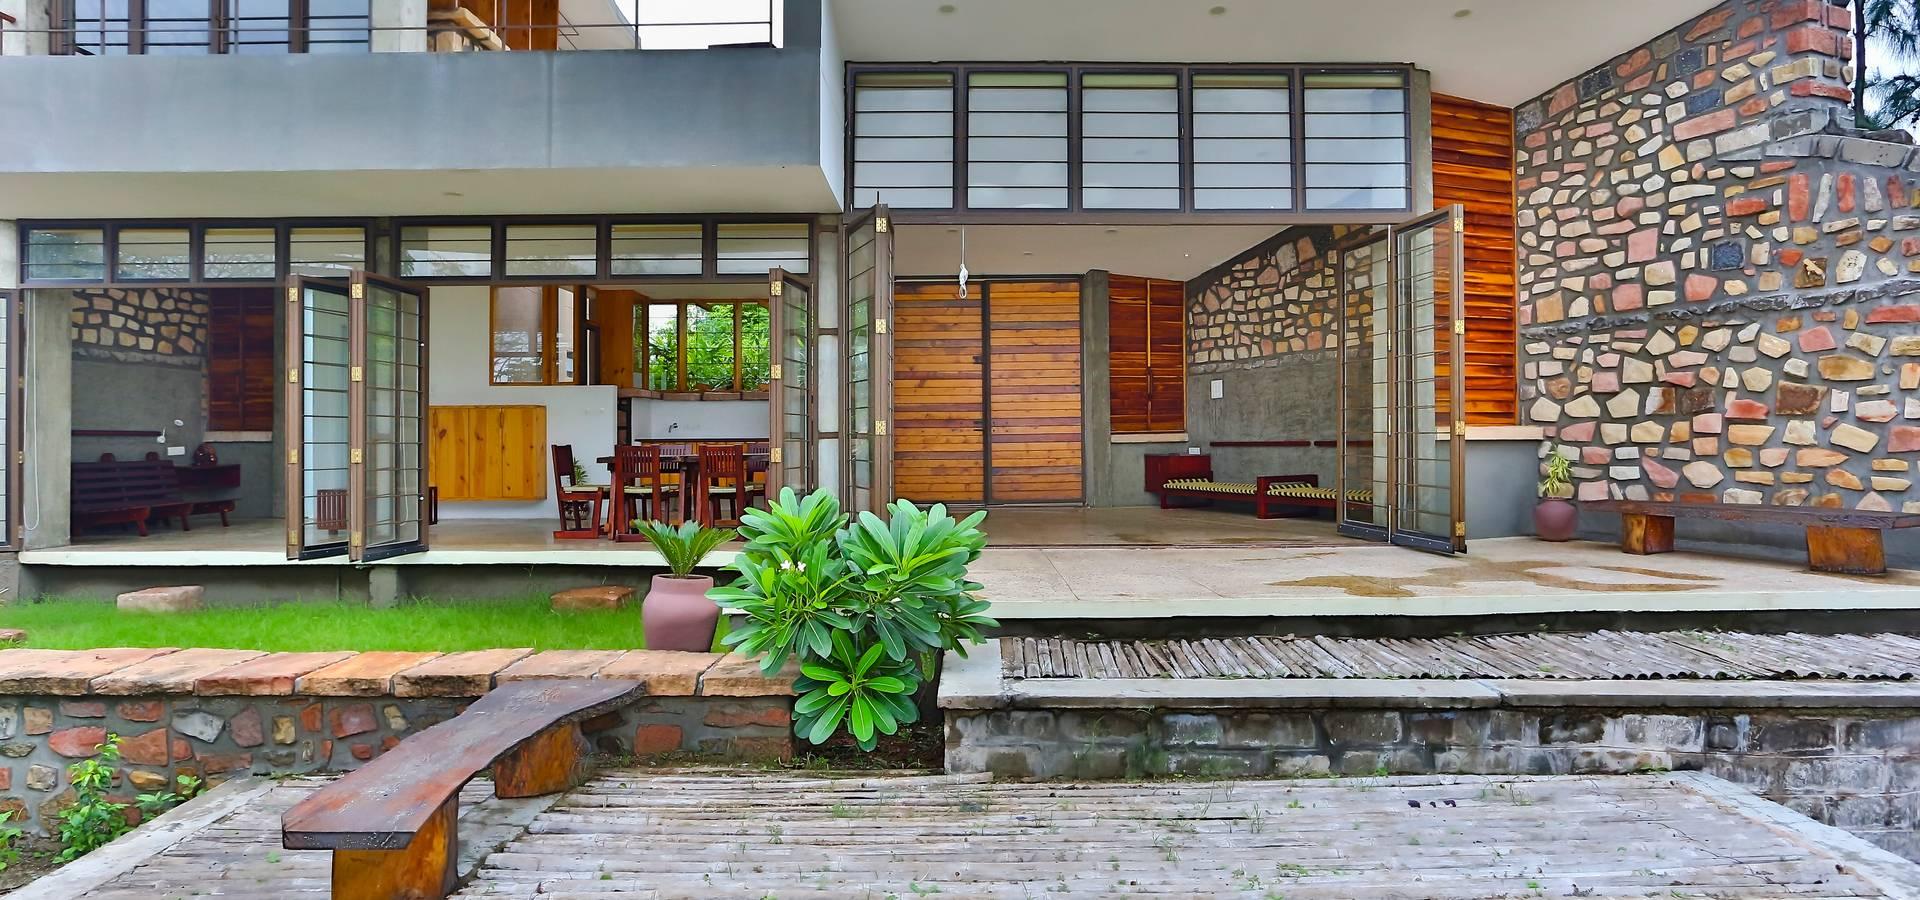 prarthit shah architects